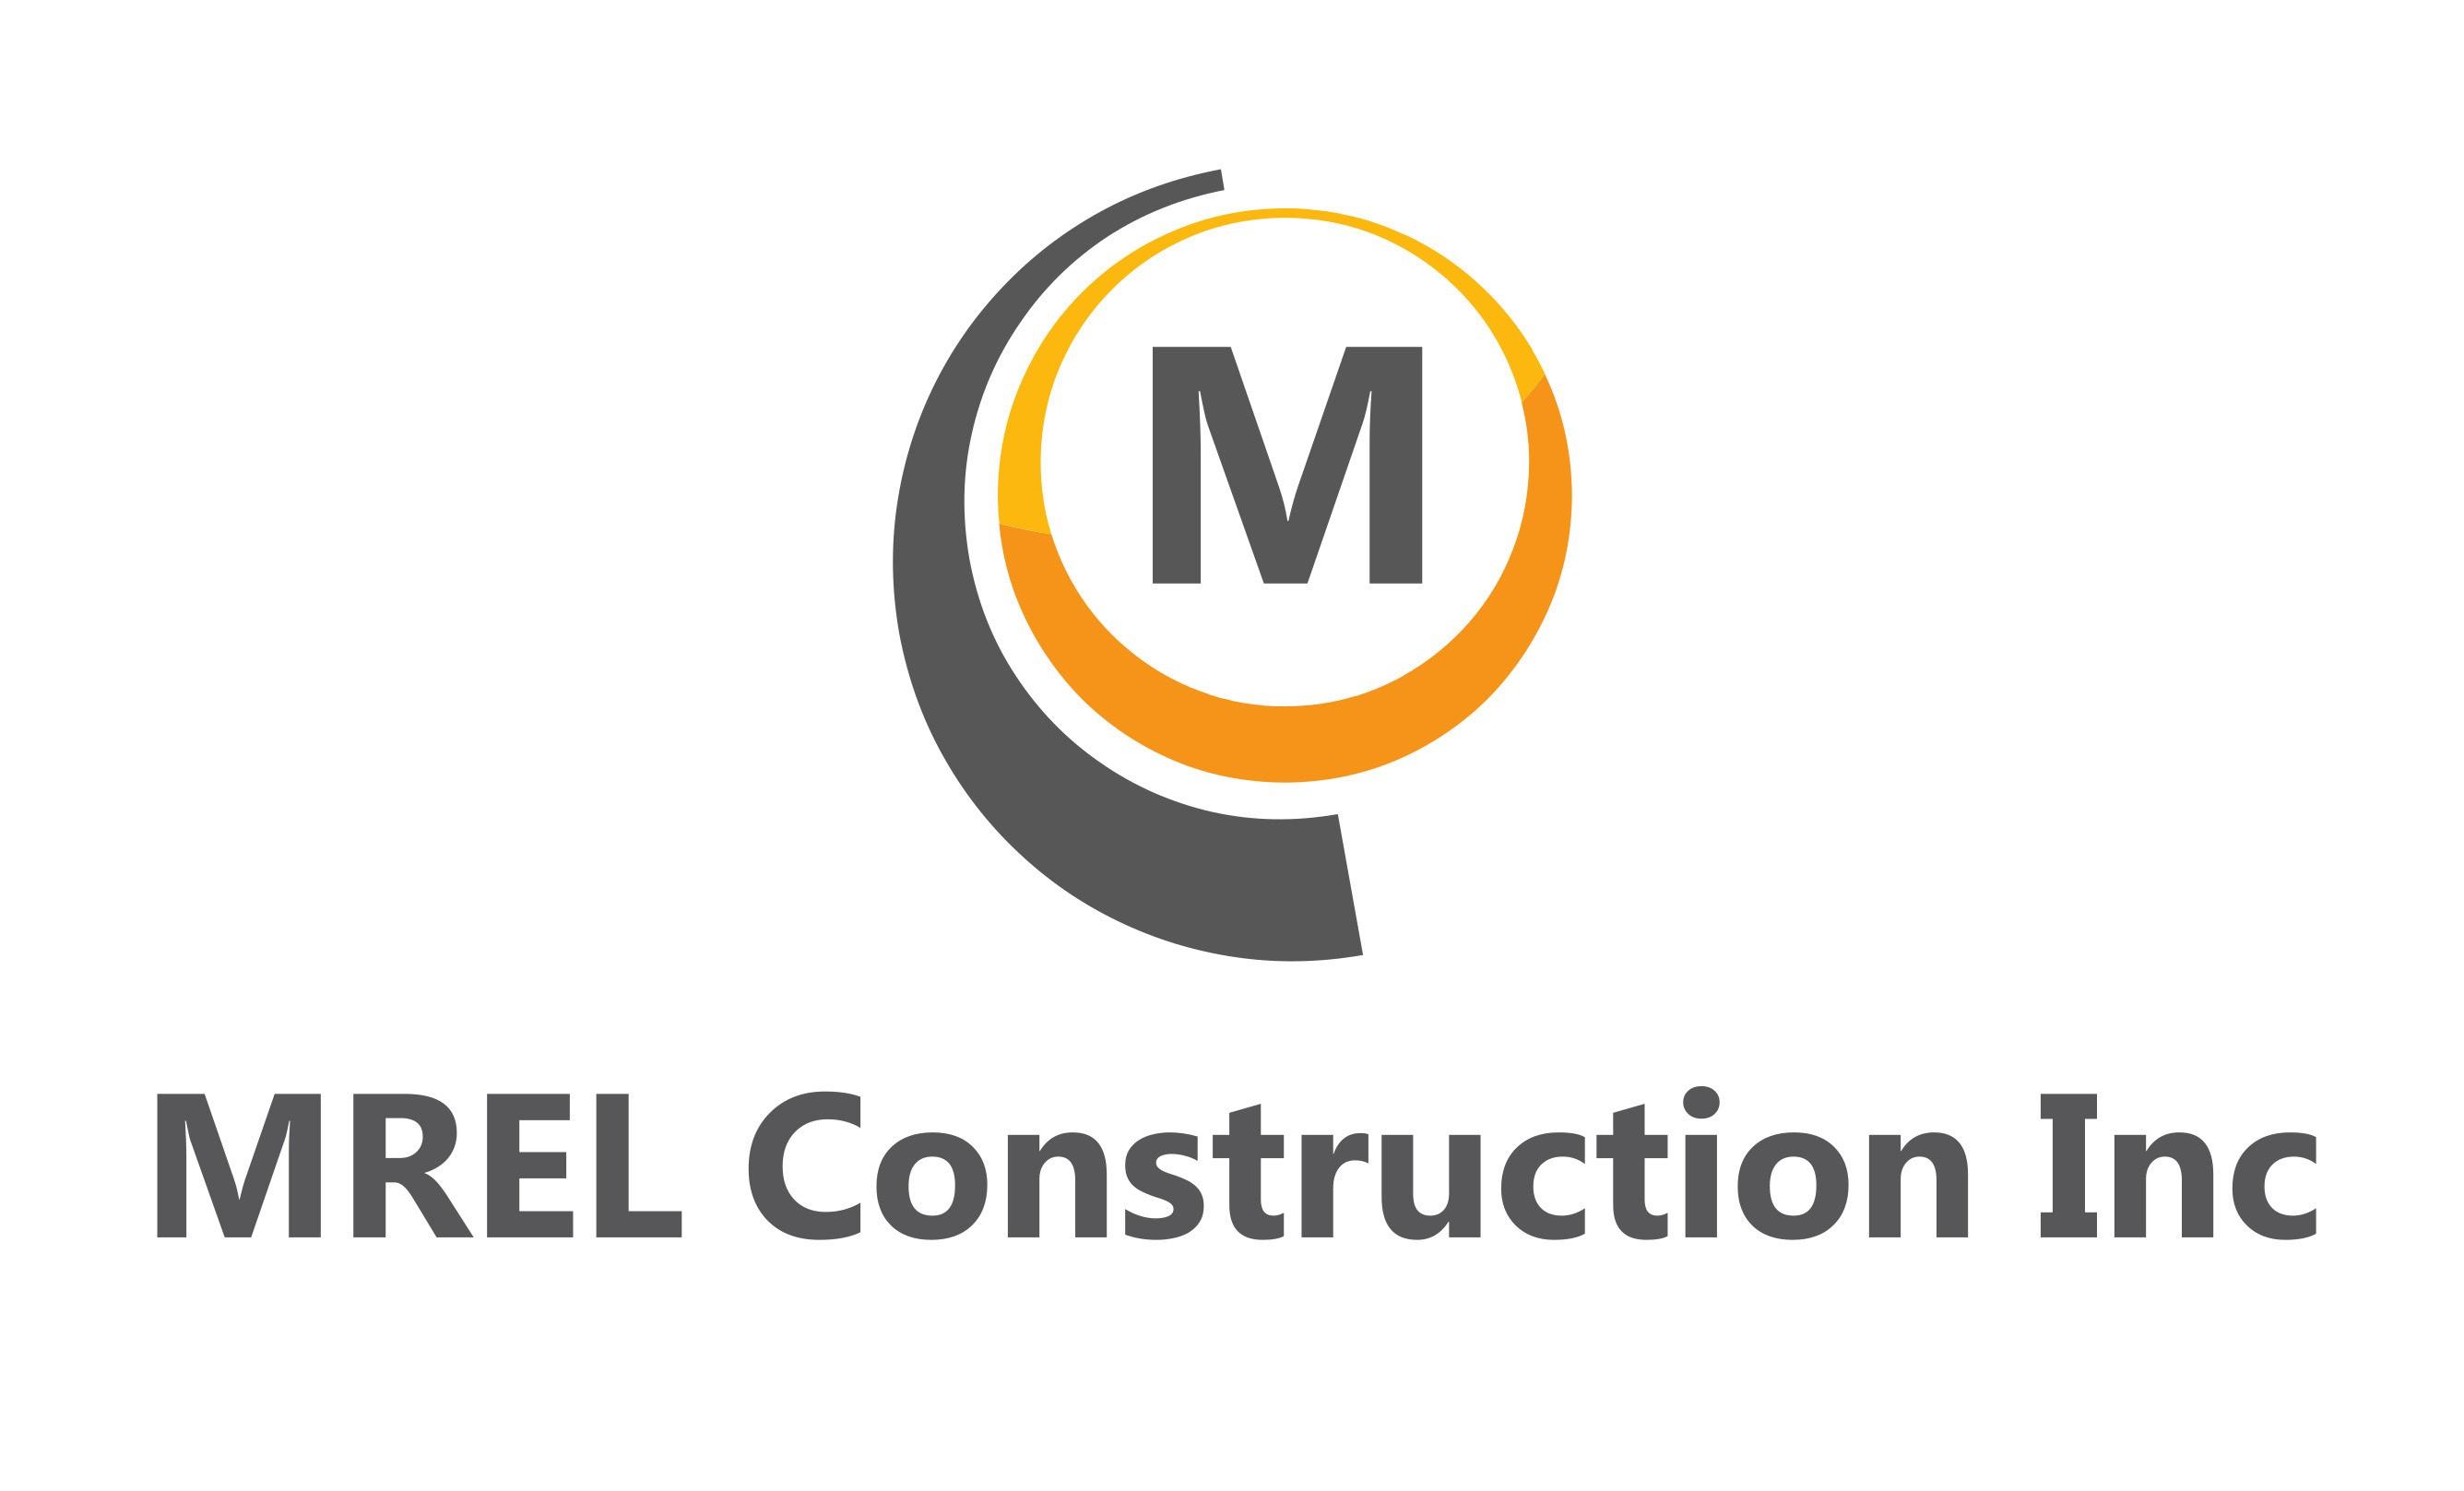 MREL CONSTRUCTION INC.